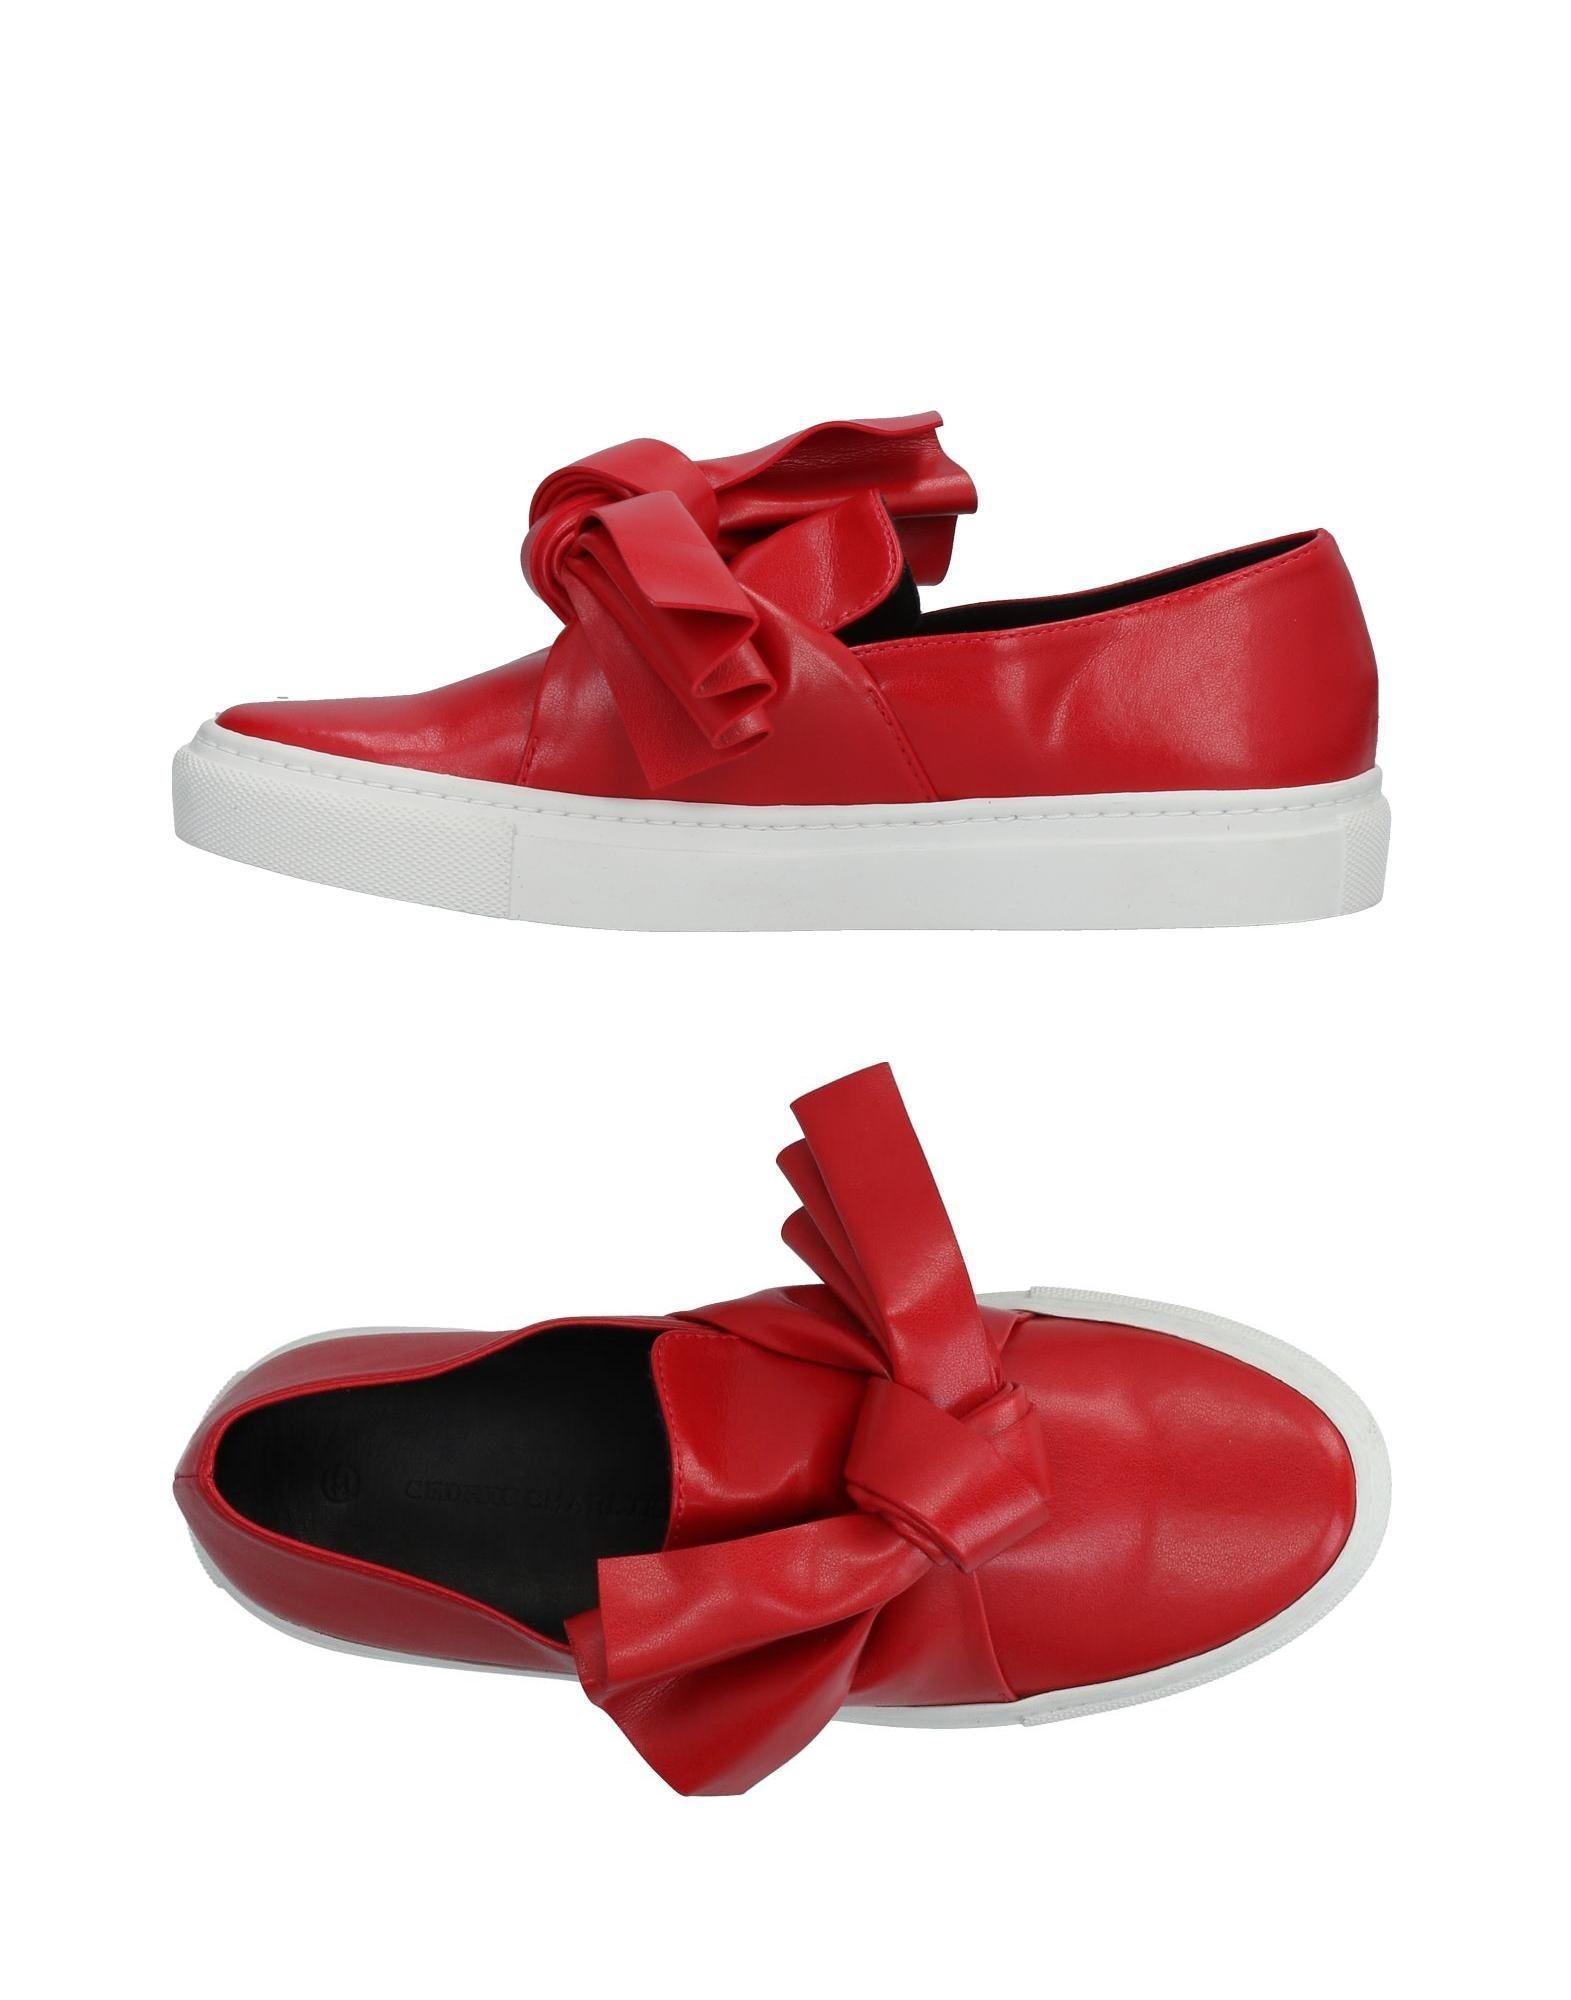 FOOTWEAR - Low-tops & sneakers on YOOX.COM Cedric Charlier 4whsARmT3